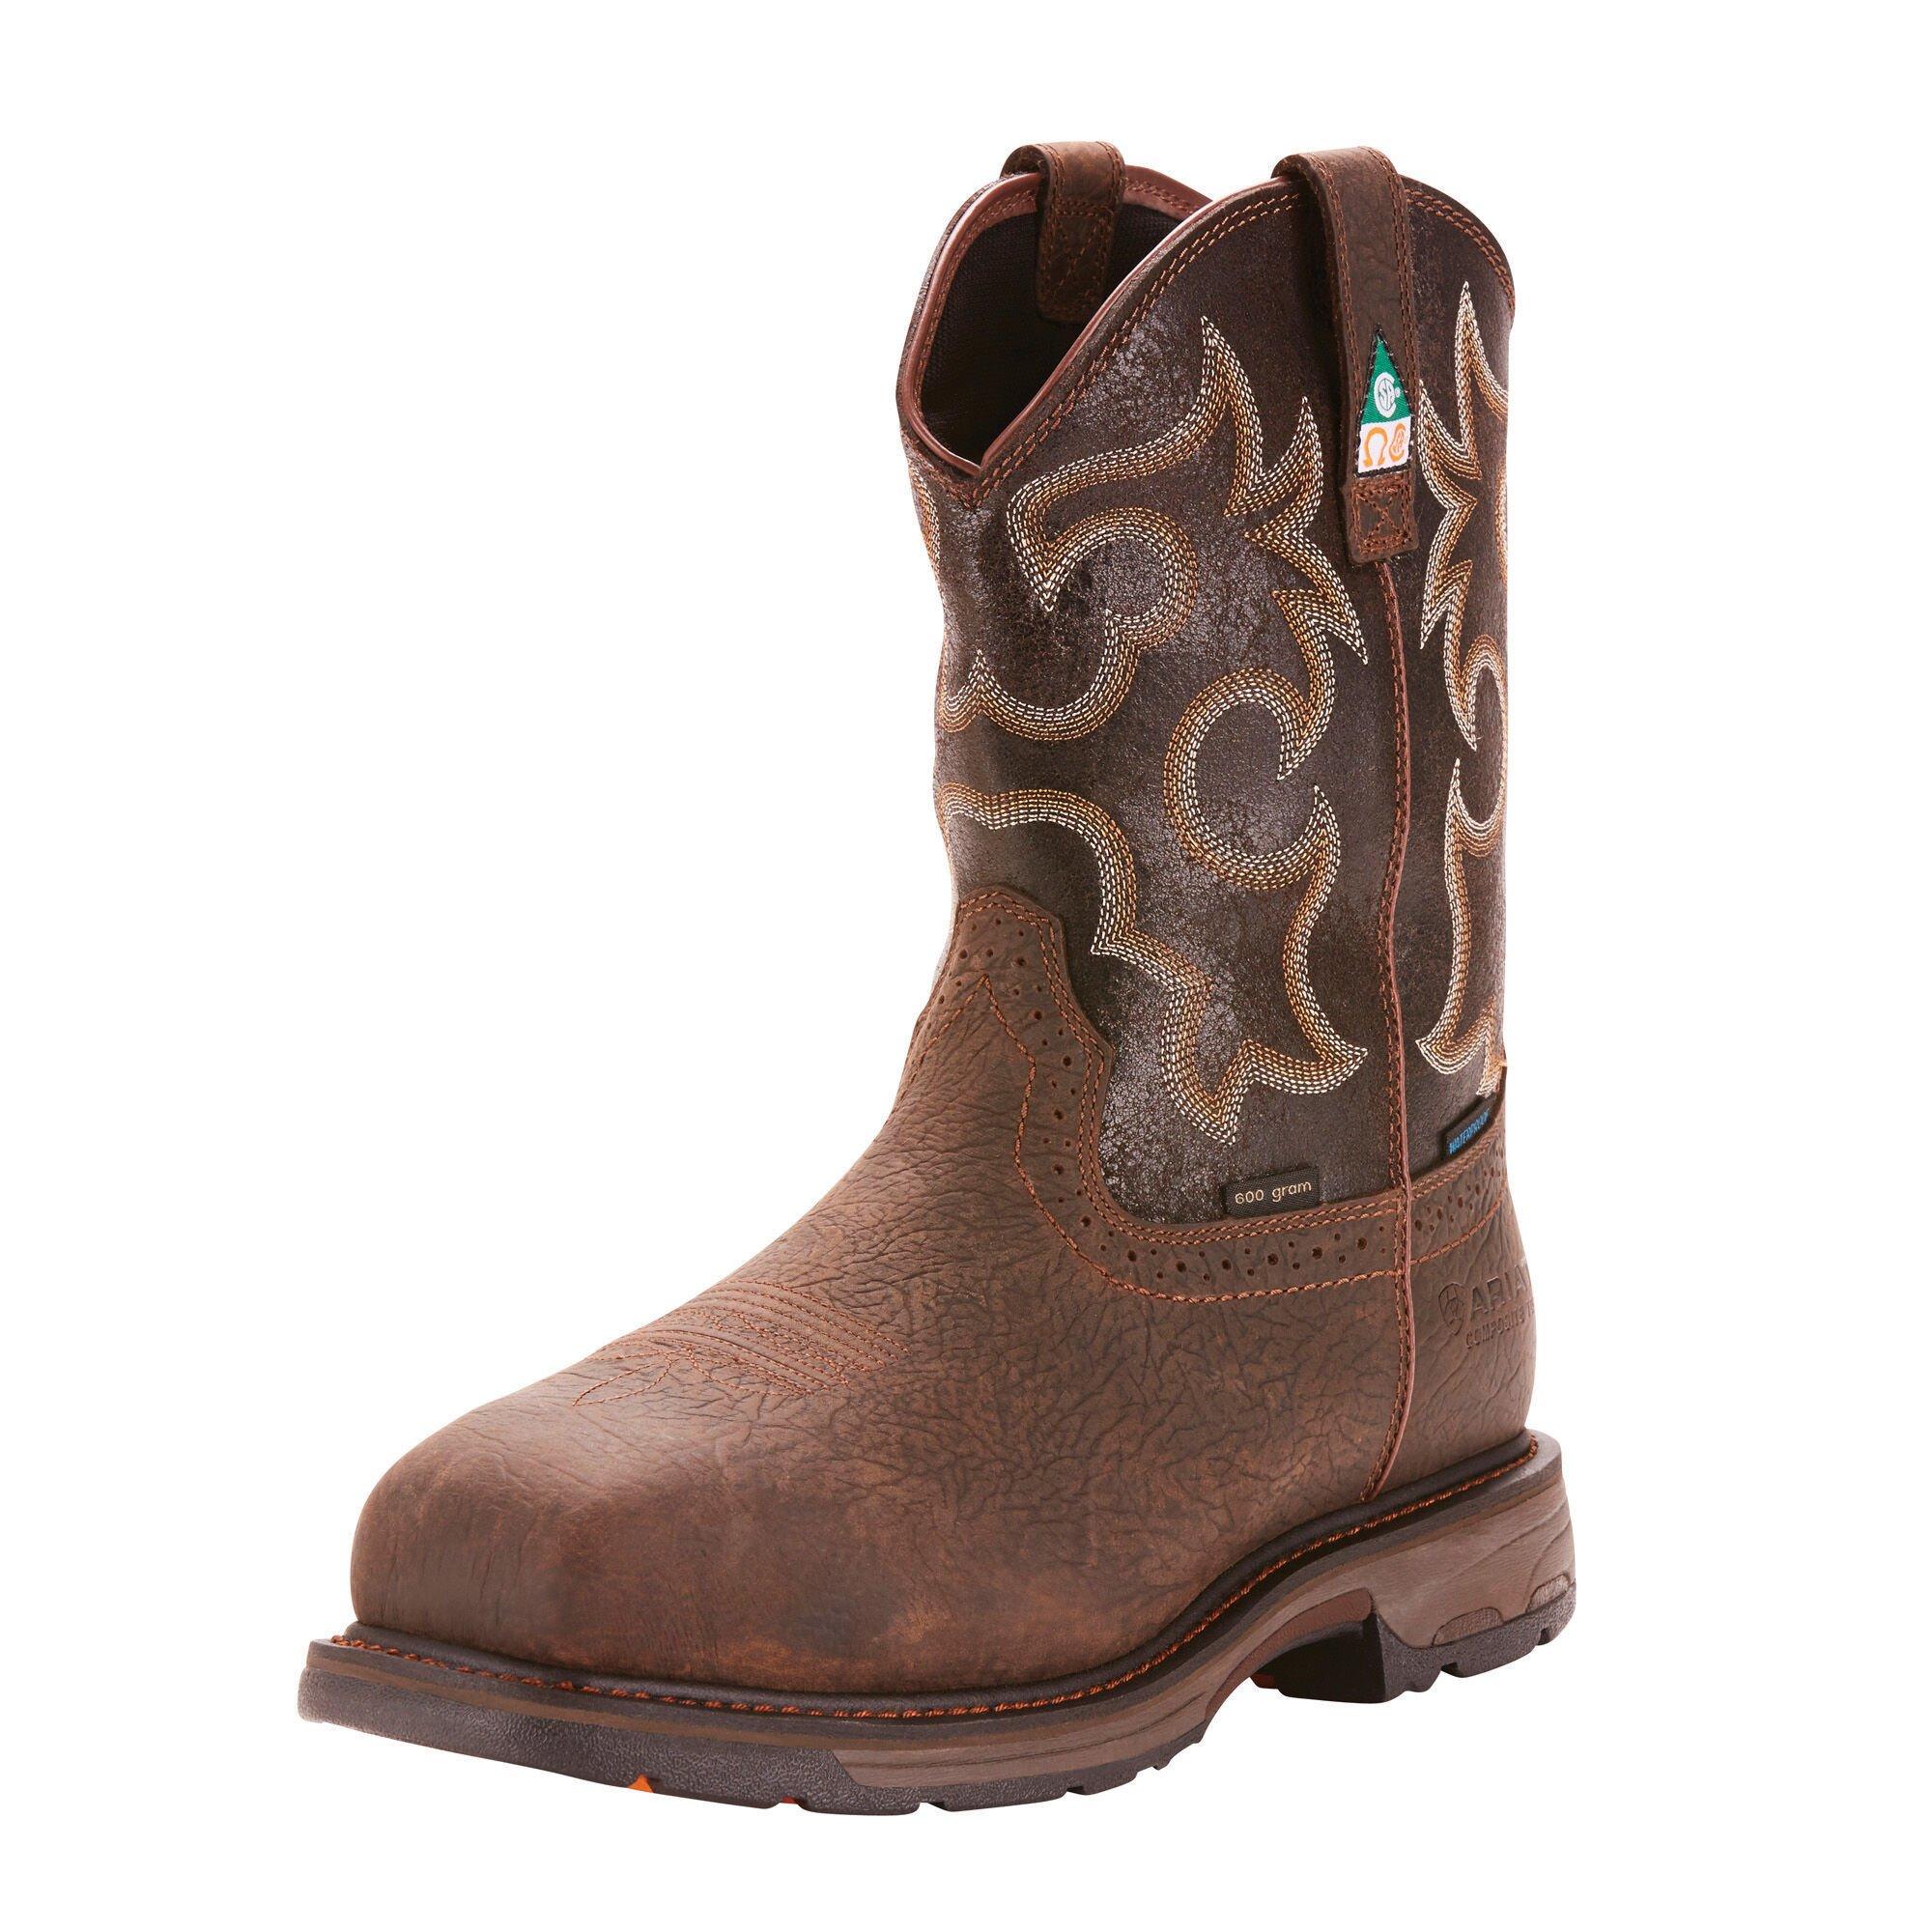 WorkHog CSA Waterproof 600g Composite Toe Work Boot